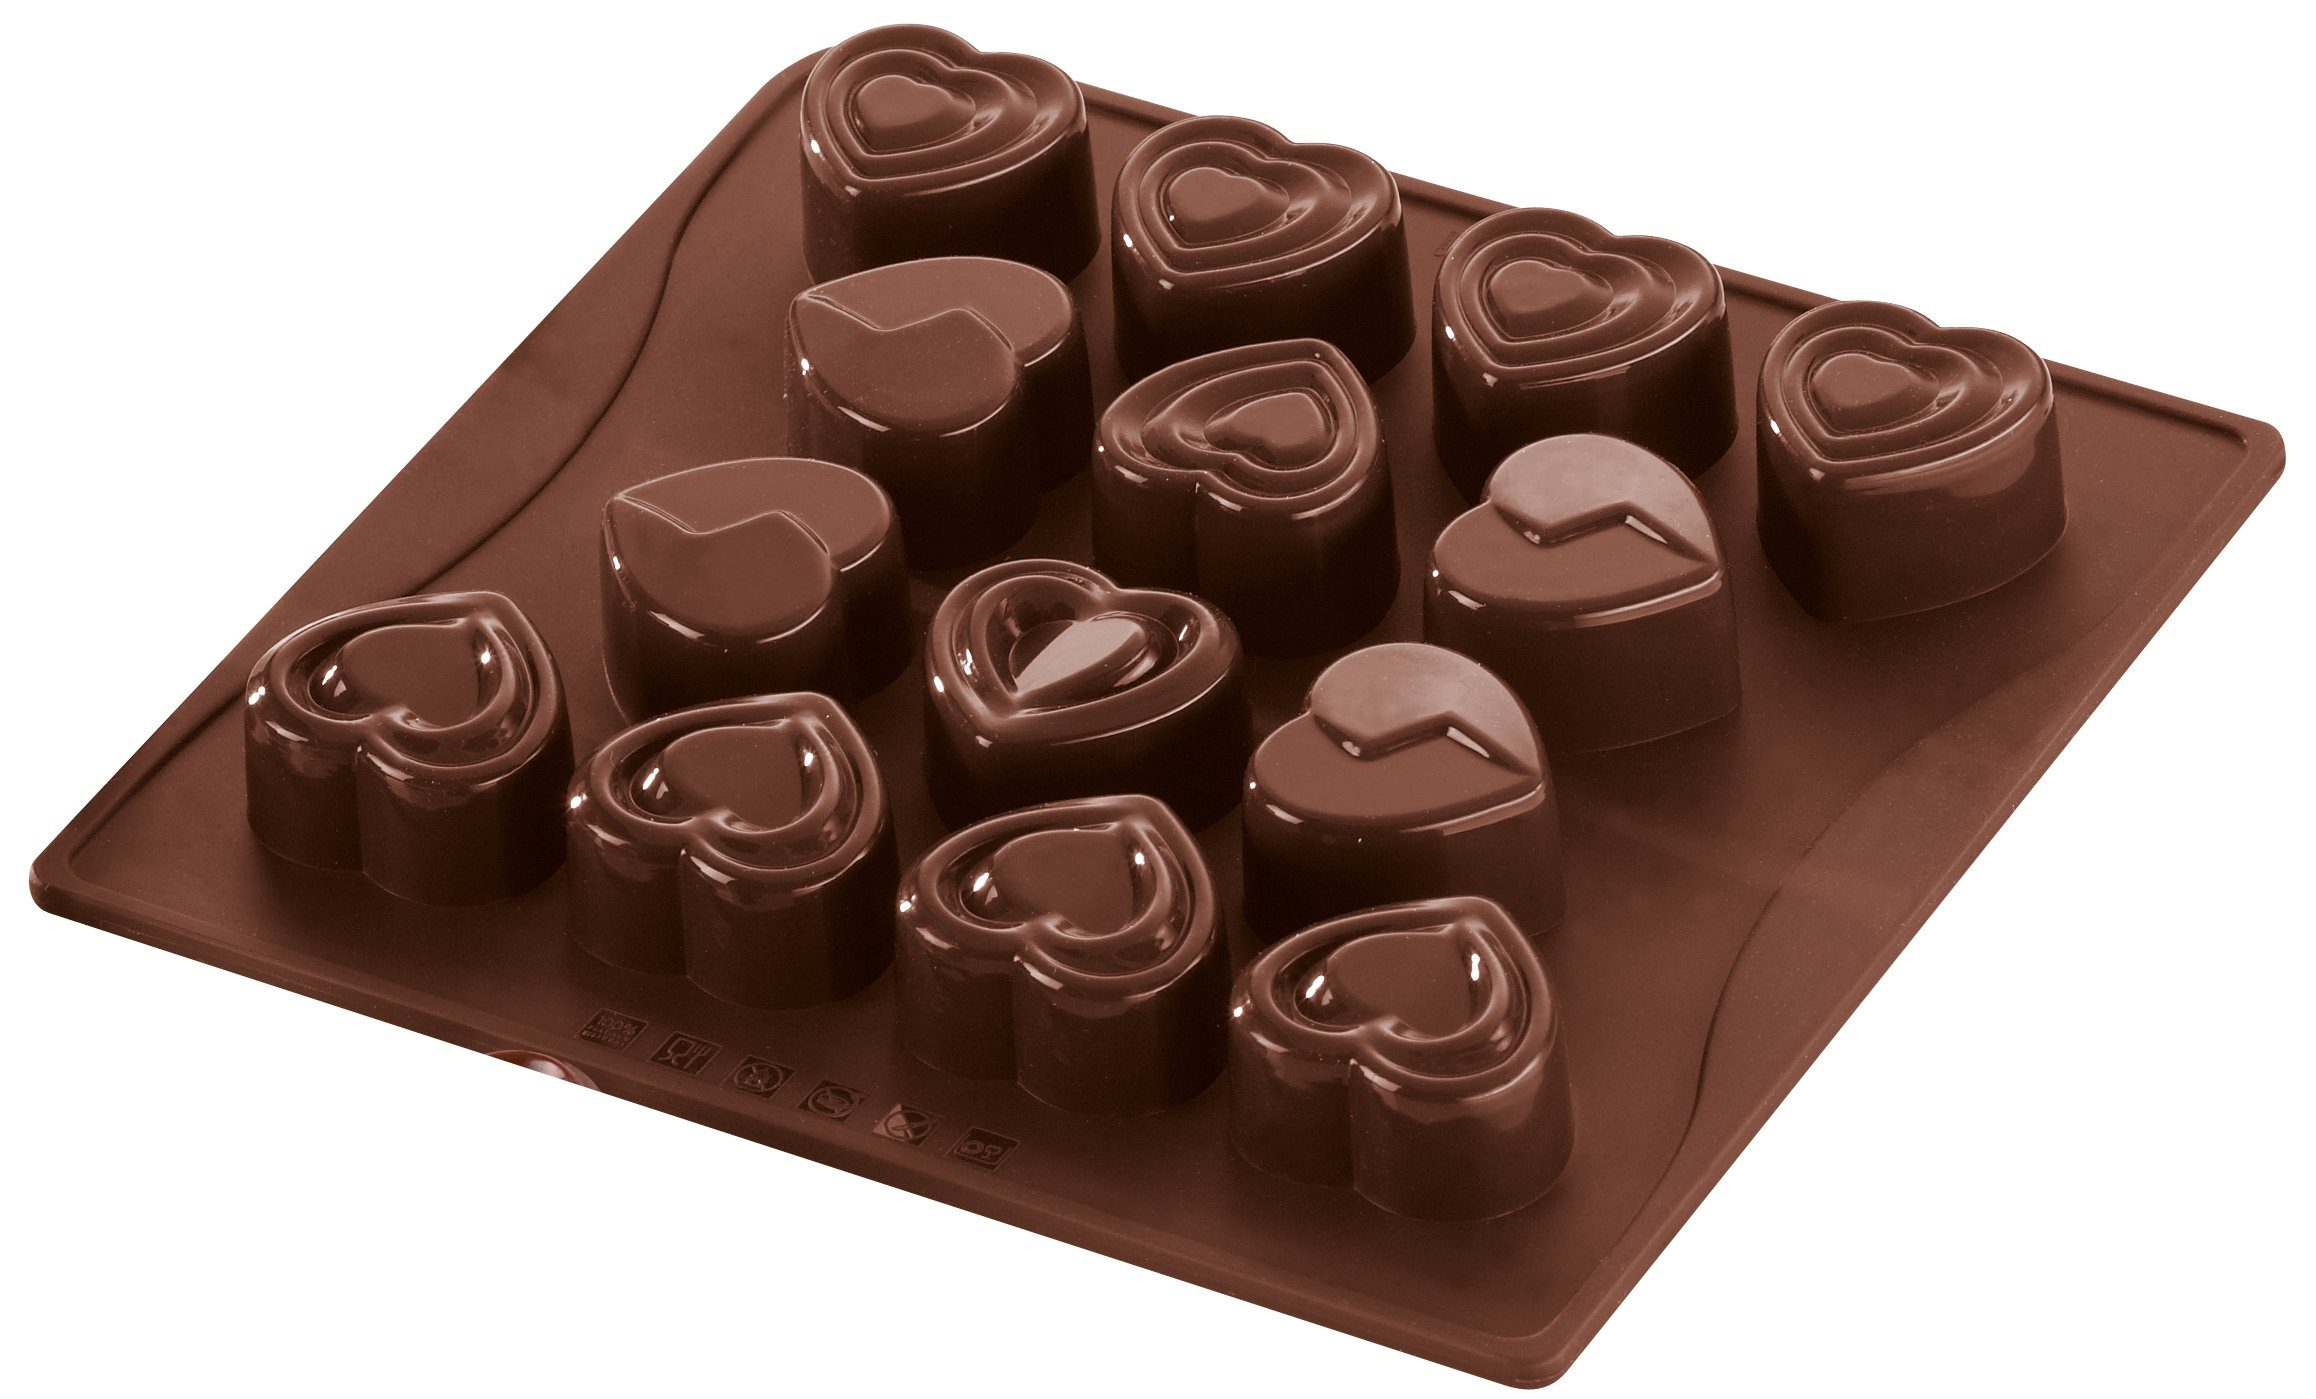 Dr. Oetker Schokoladenform Süße Herzen 14 Motive »Confiserie«